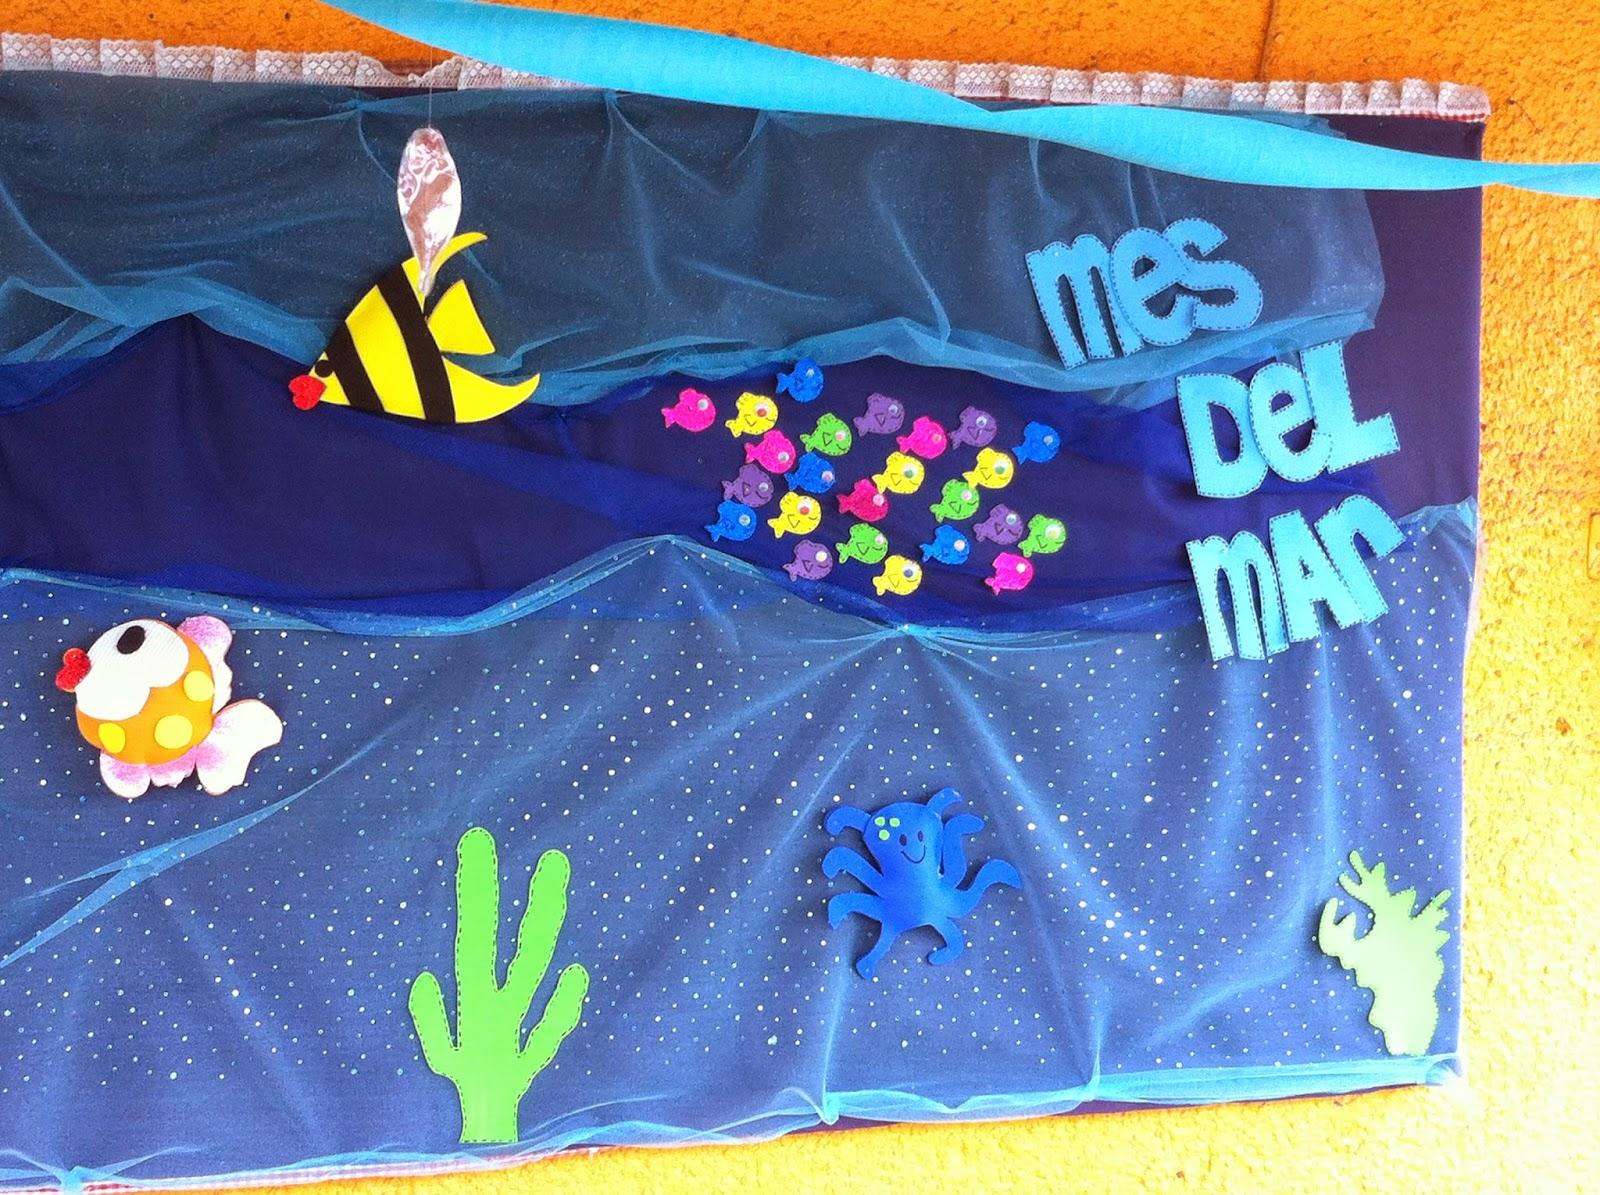 Jard n infantil un mundo de amor muestra de decoraci n for Decoracion verano para jardin infantil